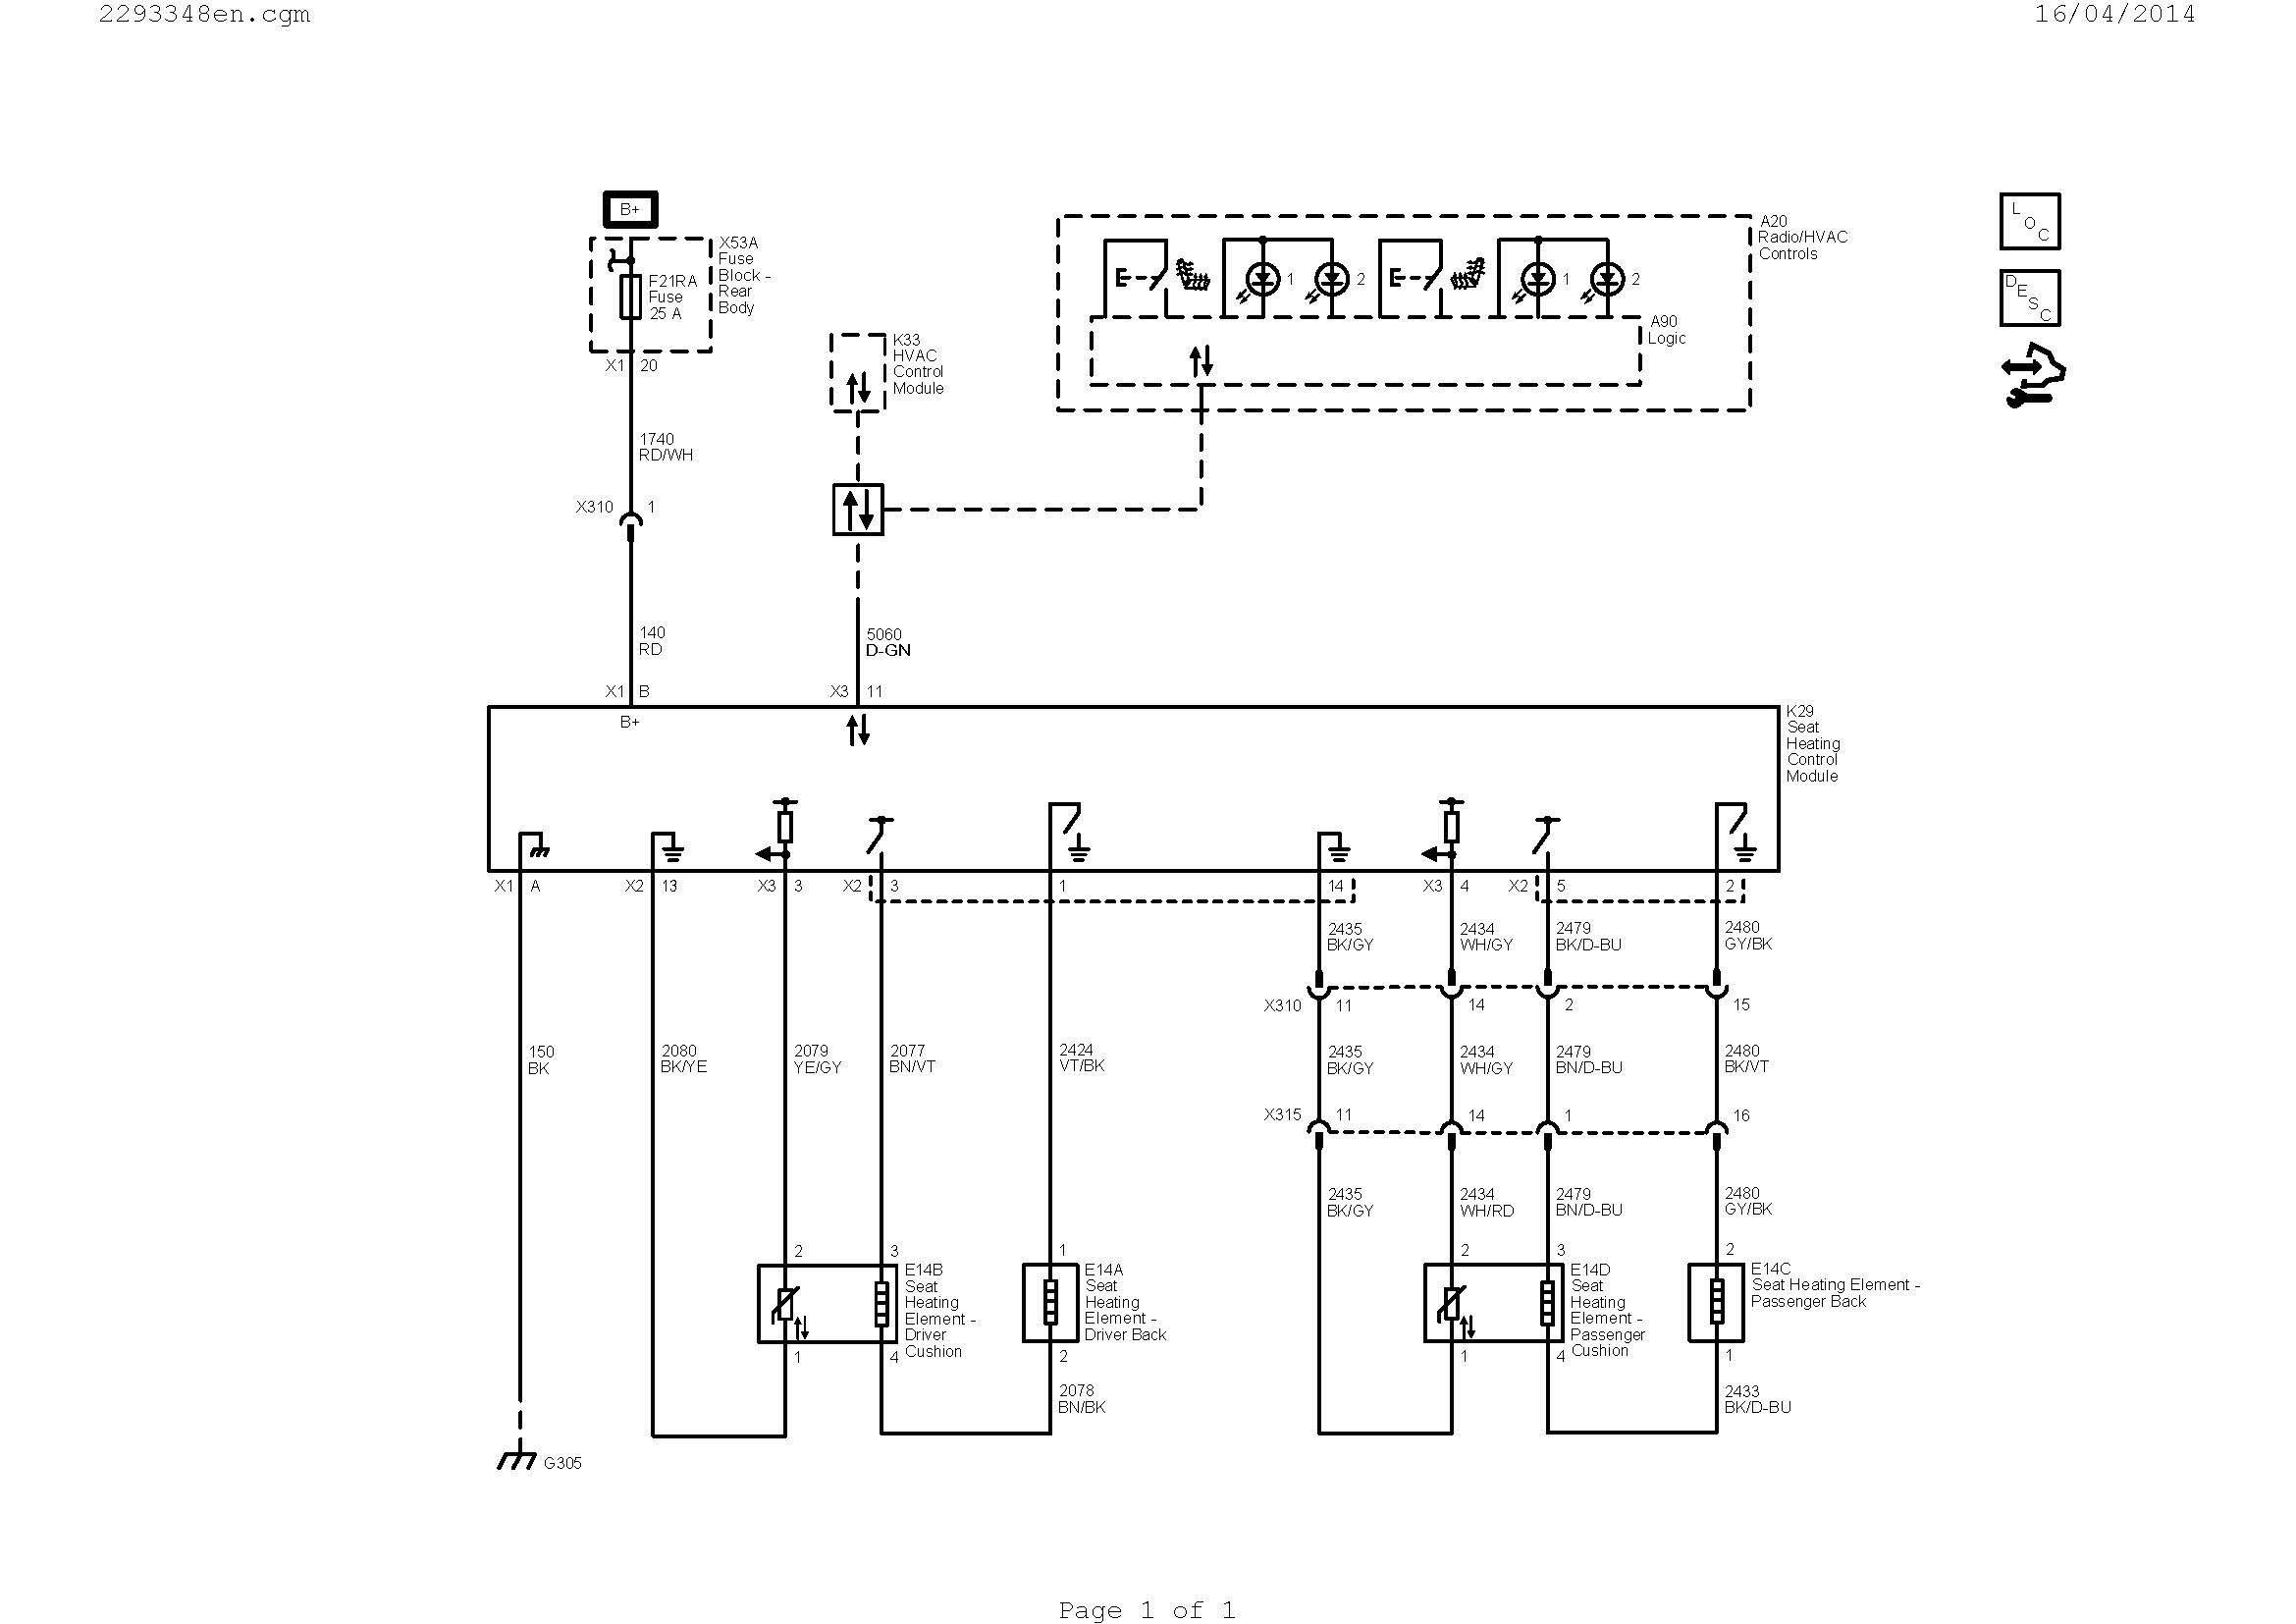 Atwood Furnace Parts Diagram Wiring Diagram for Furnace with Ac Best Furnace Parts Diagram New